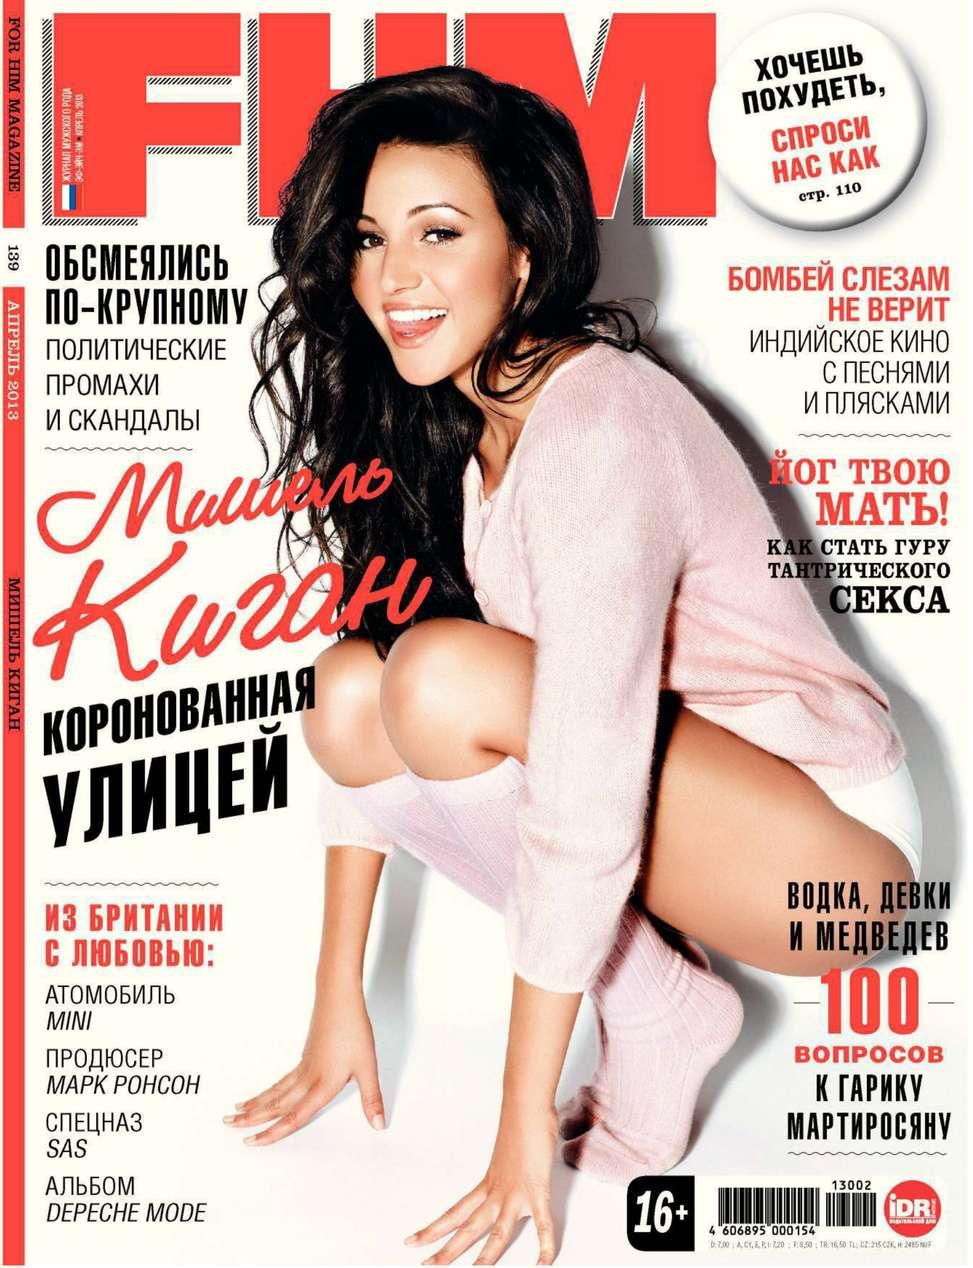 Редакция журнала FHM (For Him Magazine) FHM (For Him Magazine) 04-2013 цена и фото